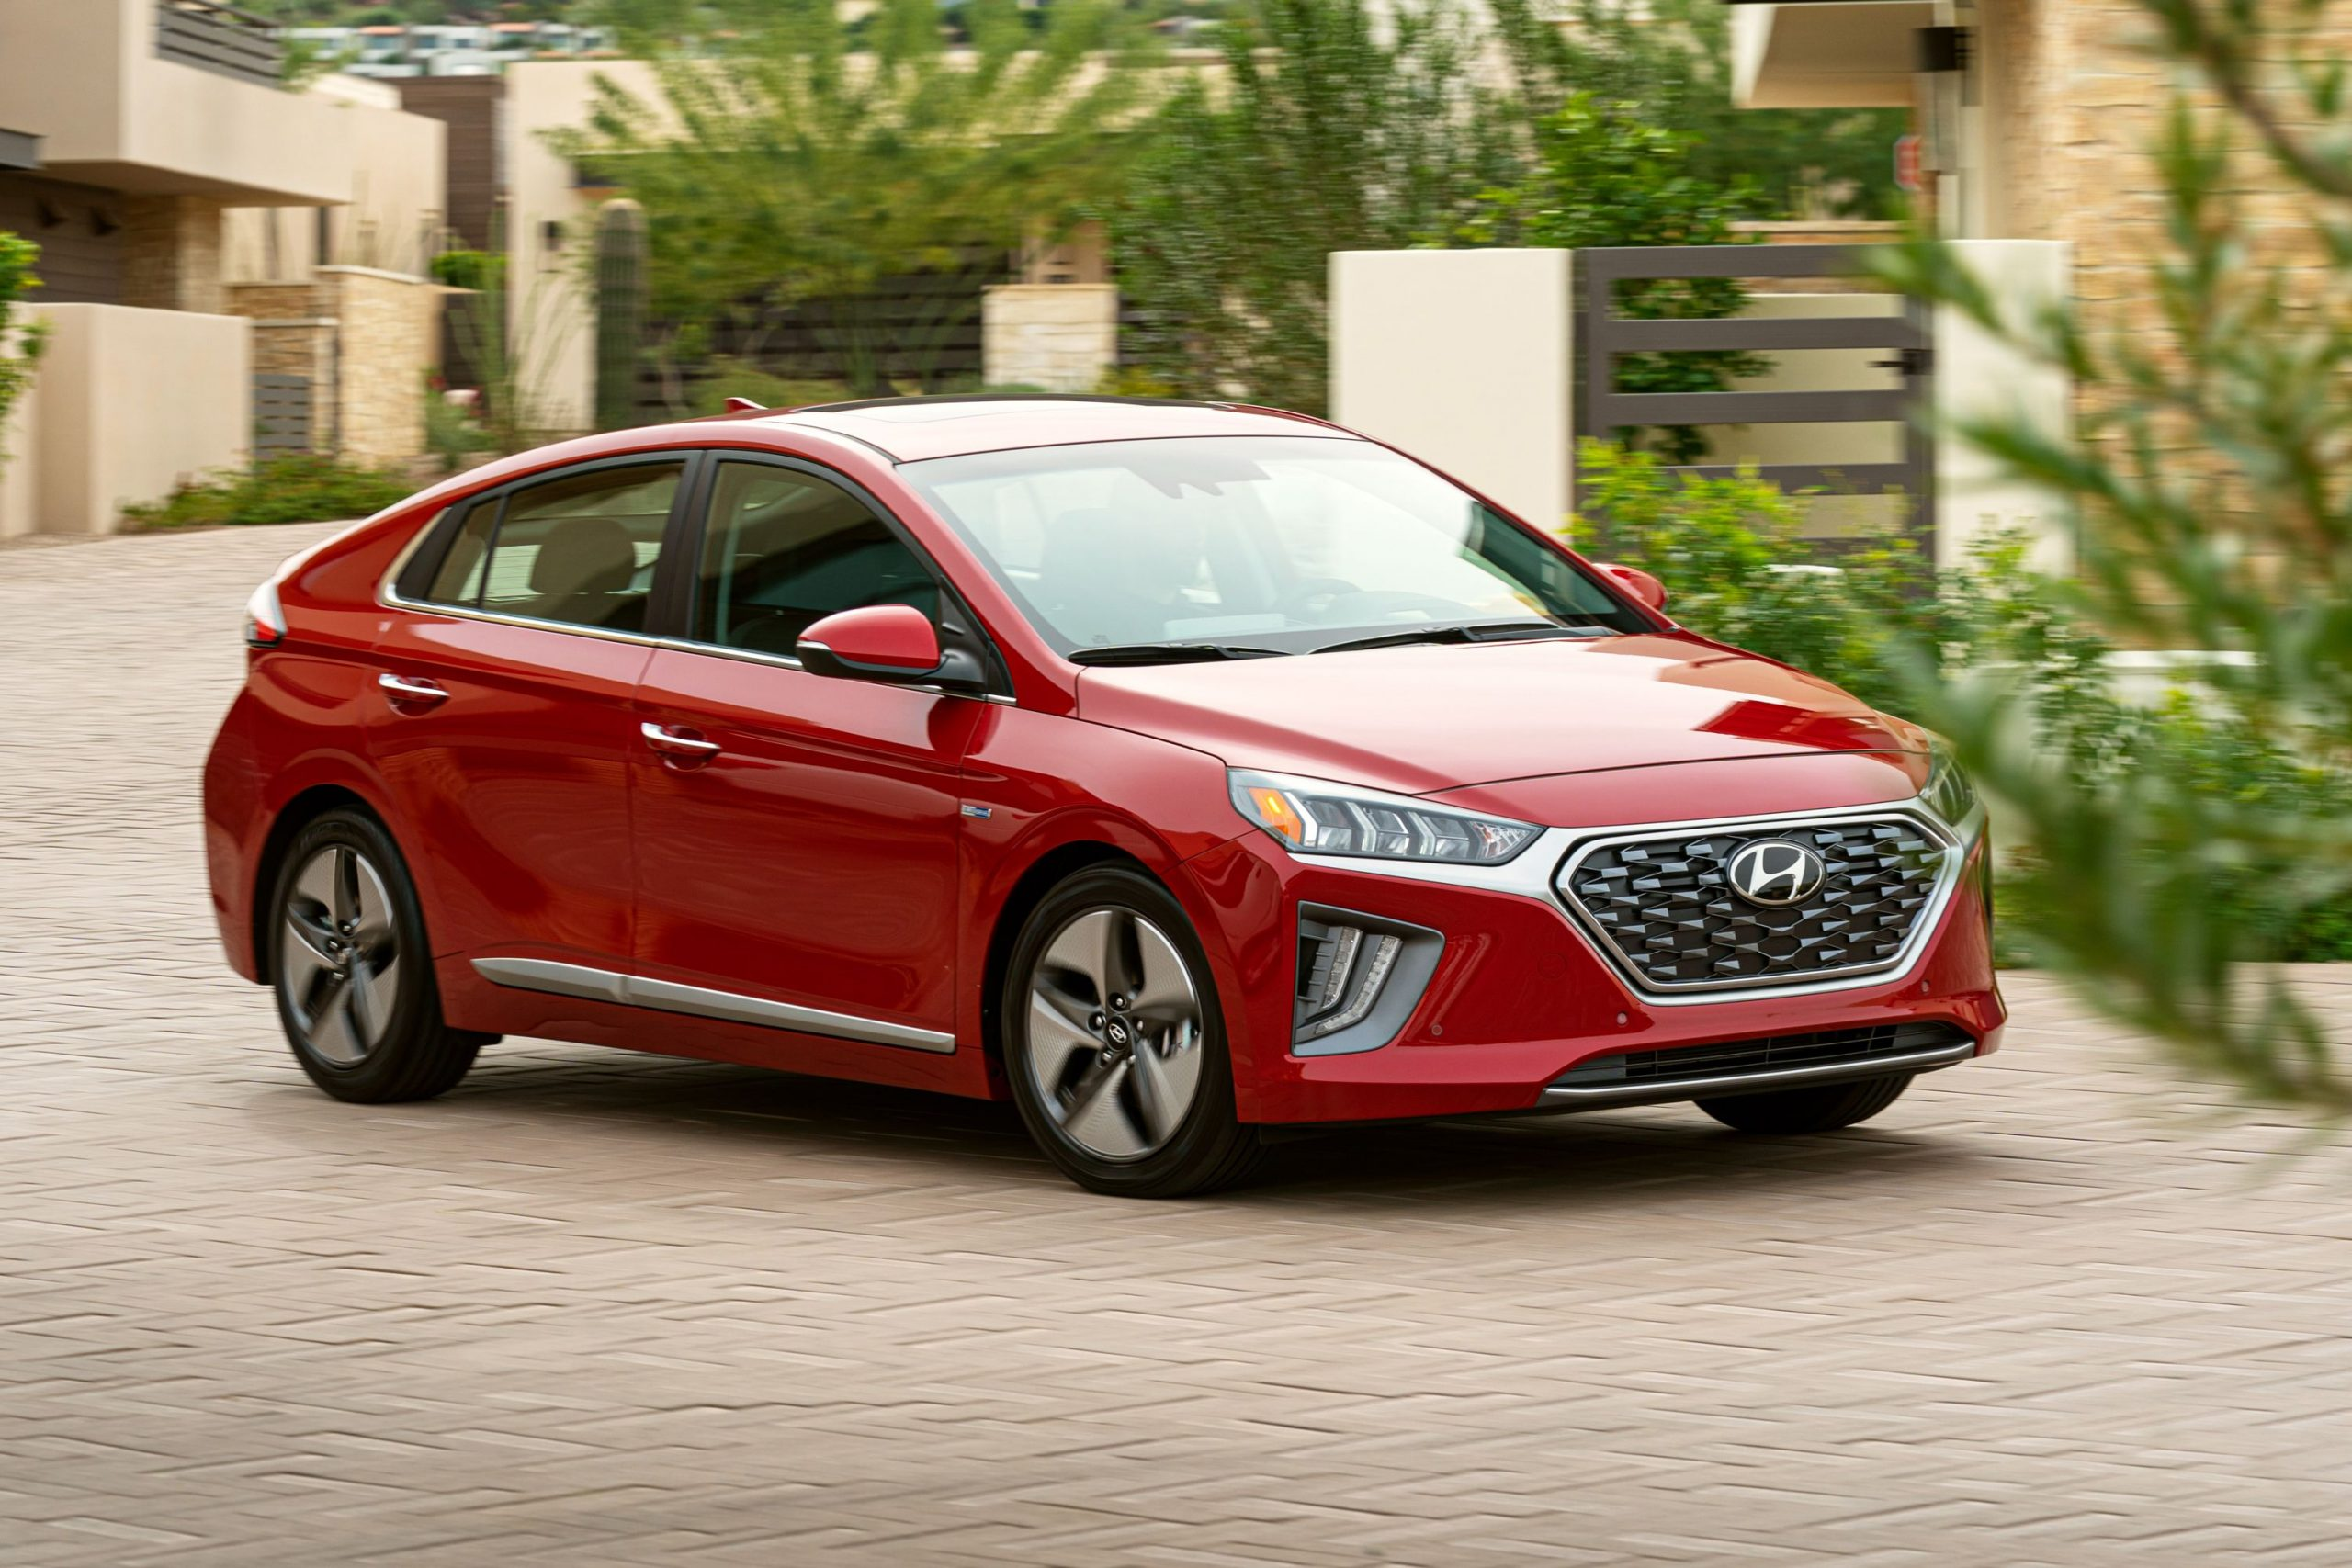 مميزات سيارة هيونداي أيونيك وعيوبها وأسعارها Hyundai Ionic